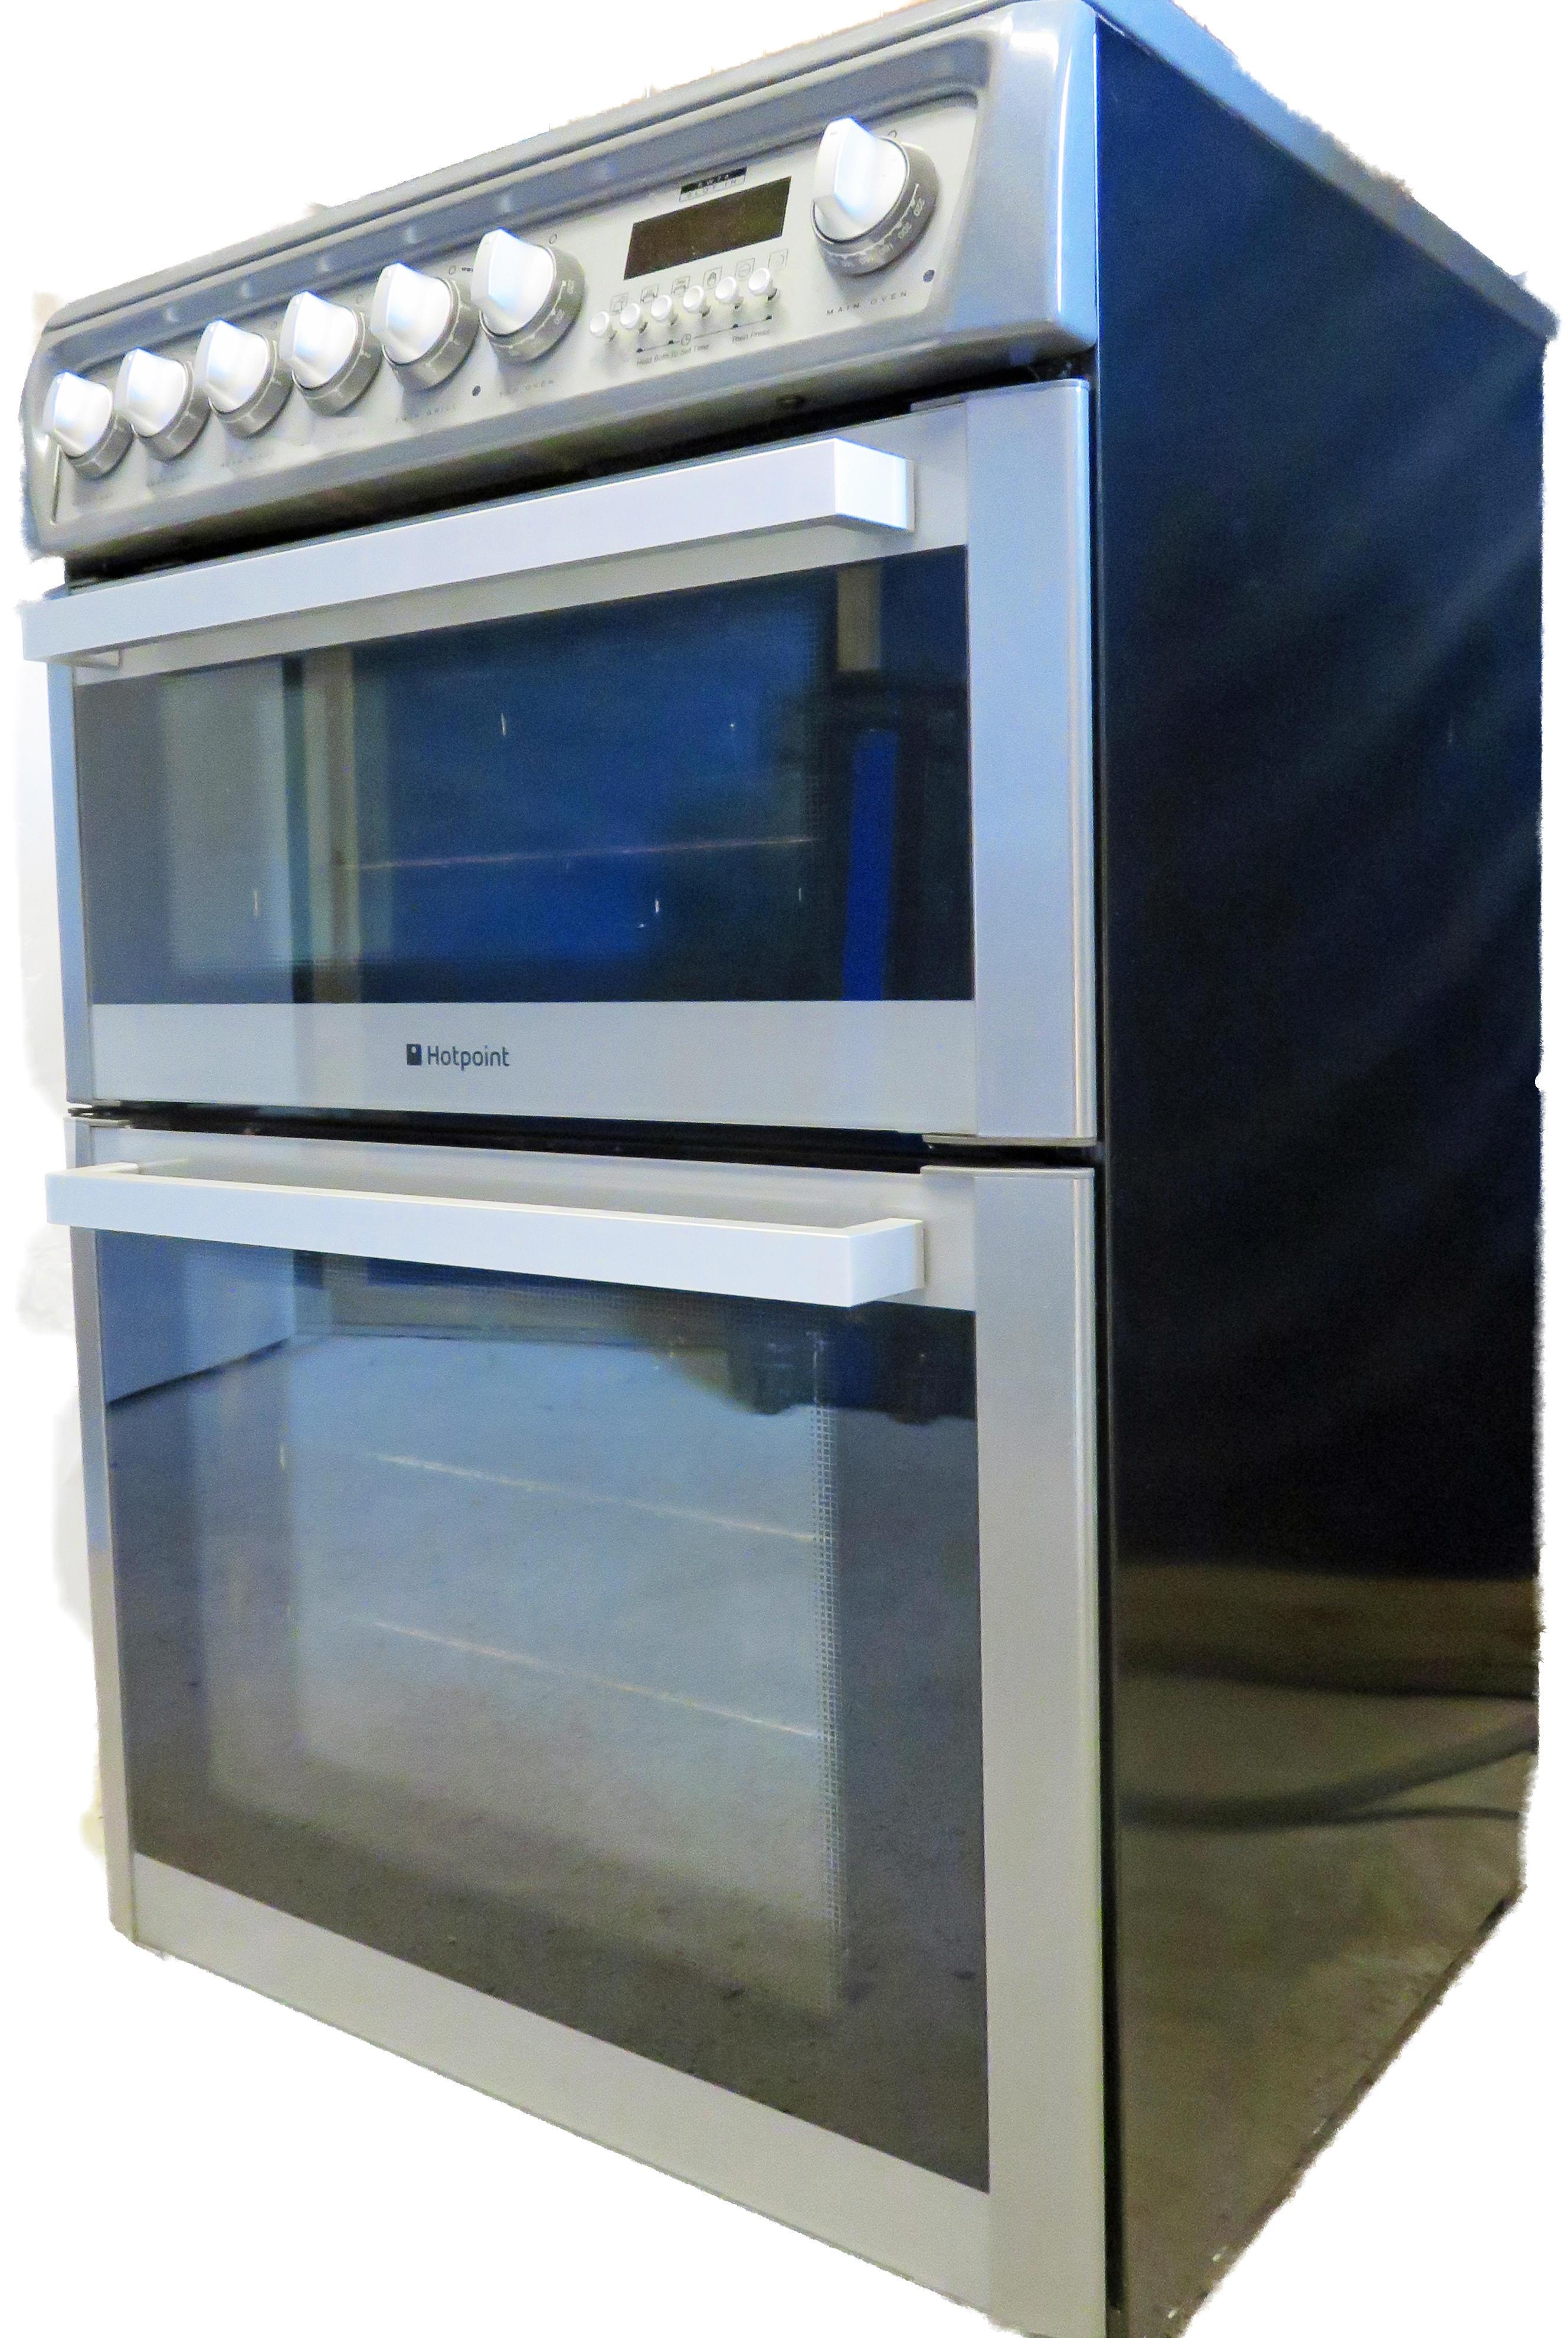 Leisure Cuisinemaster 100 Range Double Oven Cooker Posot